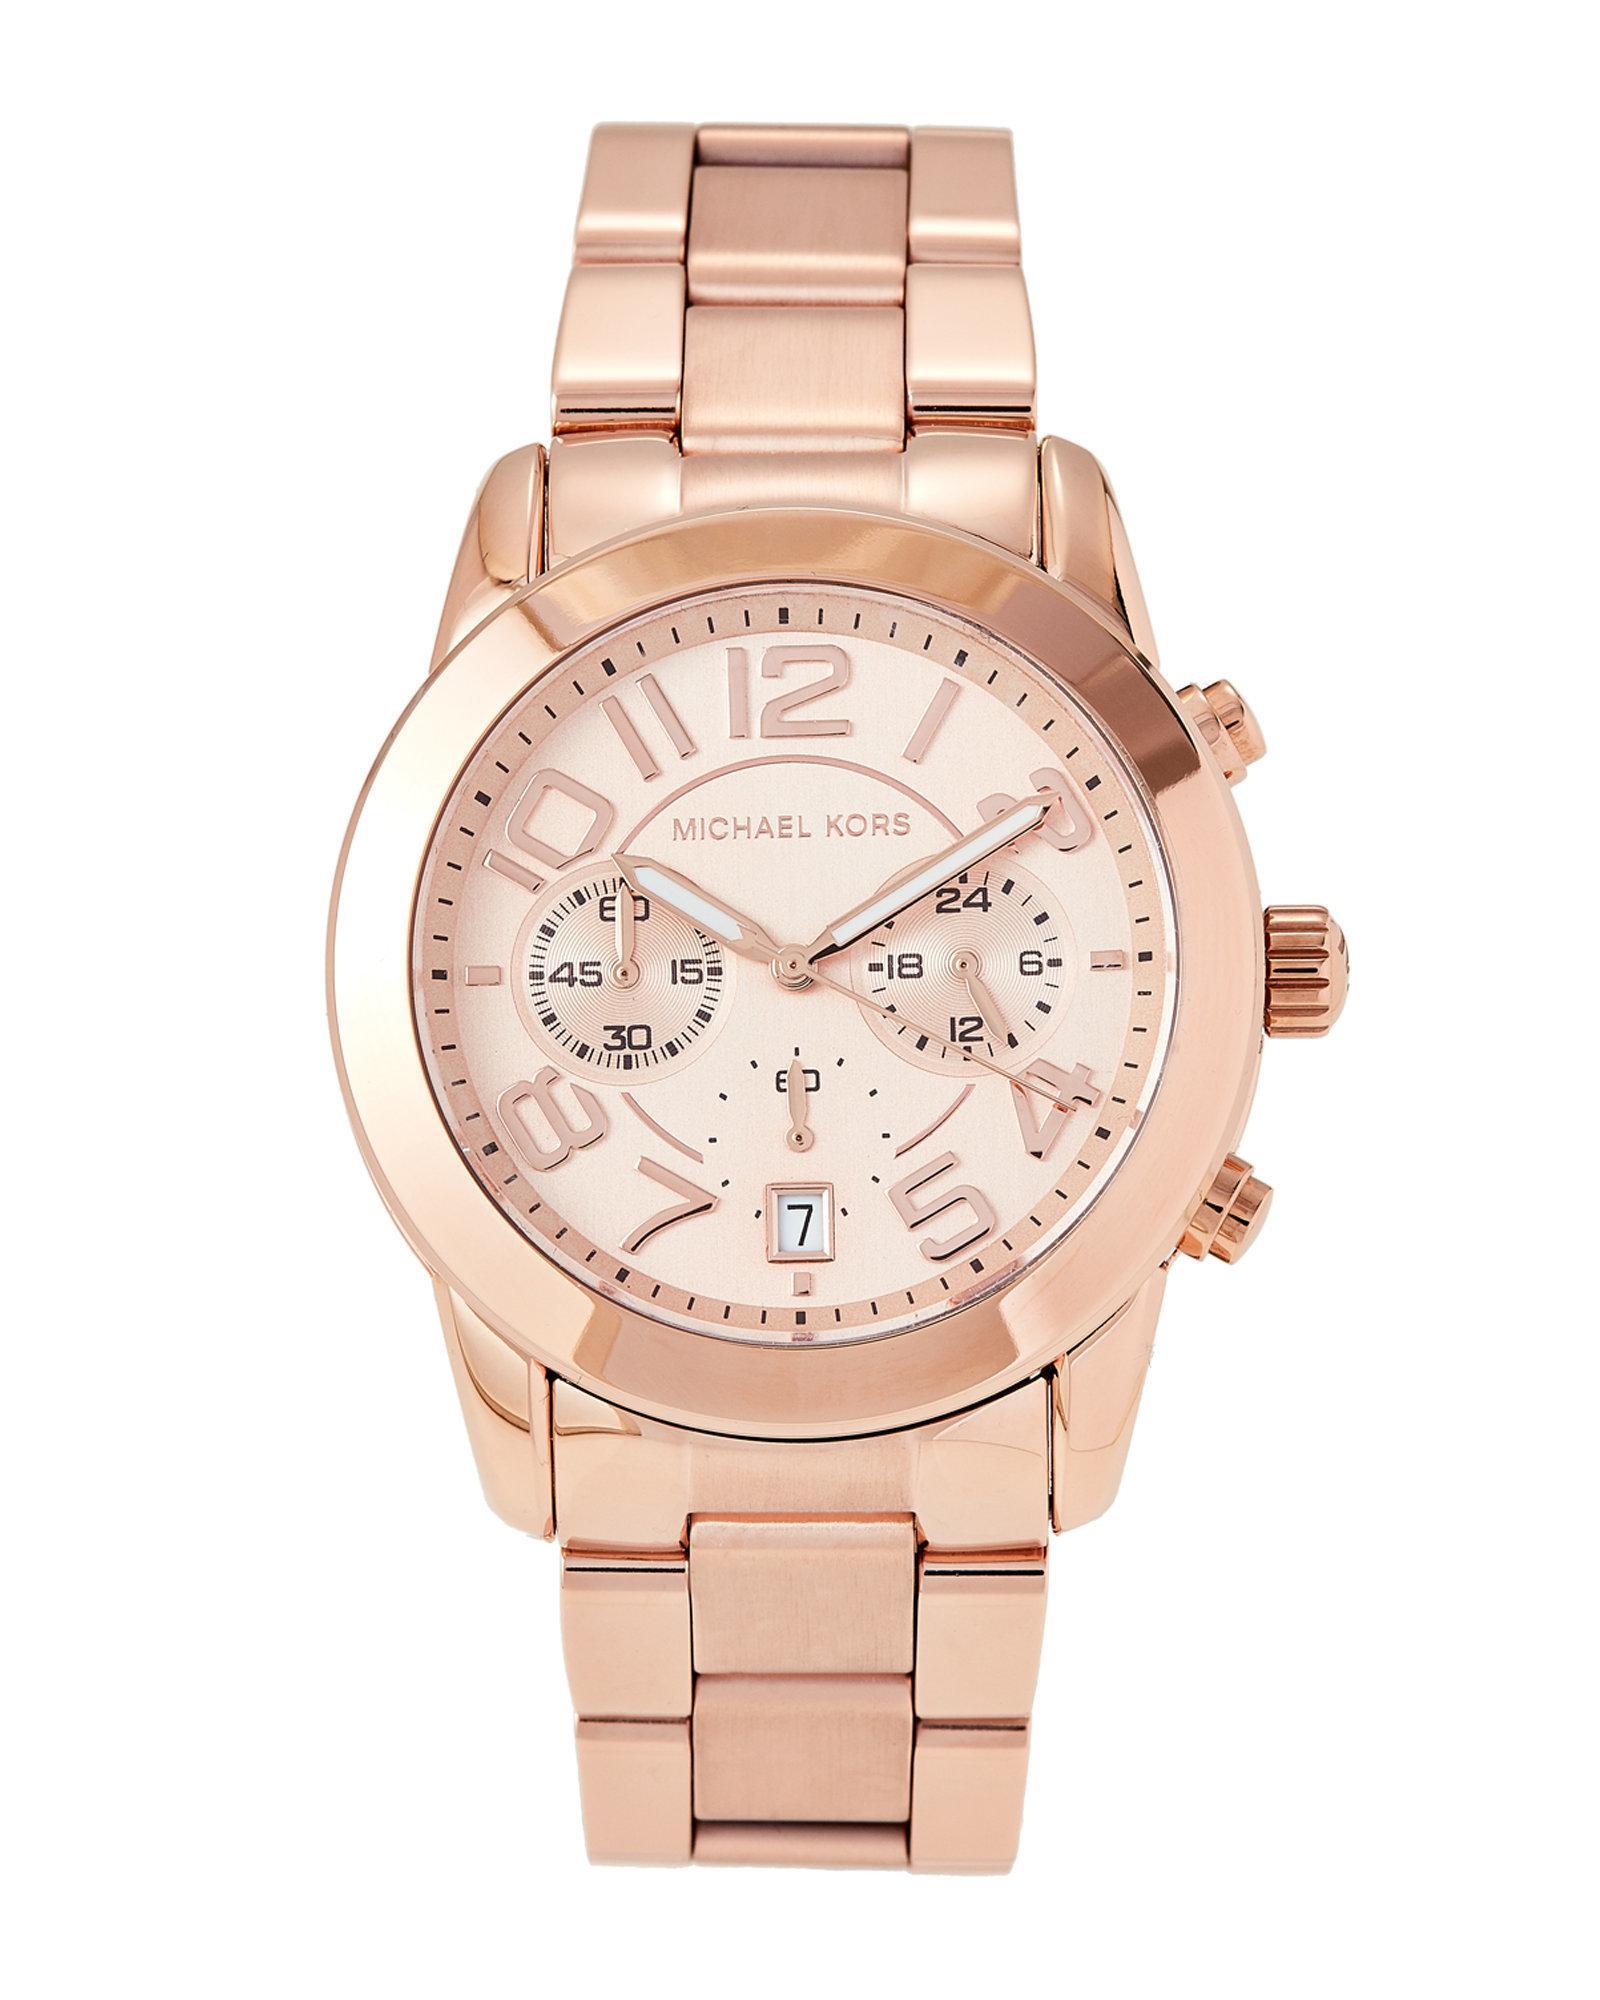 fafafffab888 Lyst - Michael Kors Mk5727 Rose Gold-tone Mercer Watch in Pink